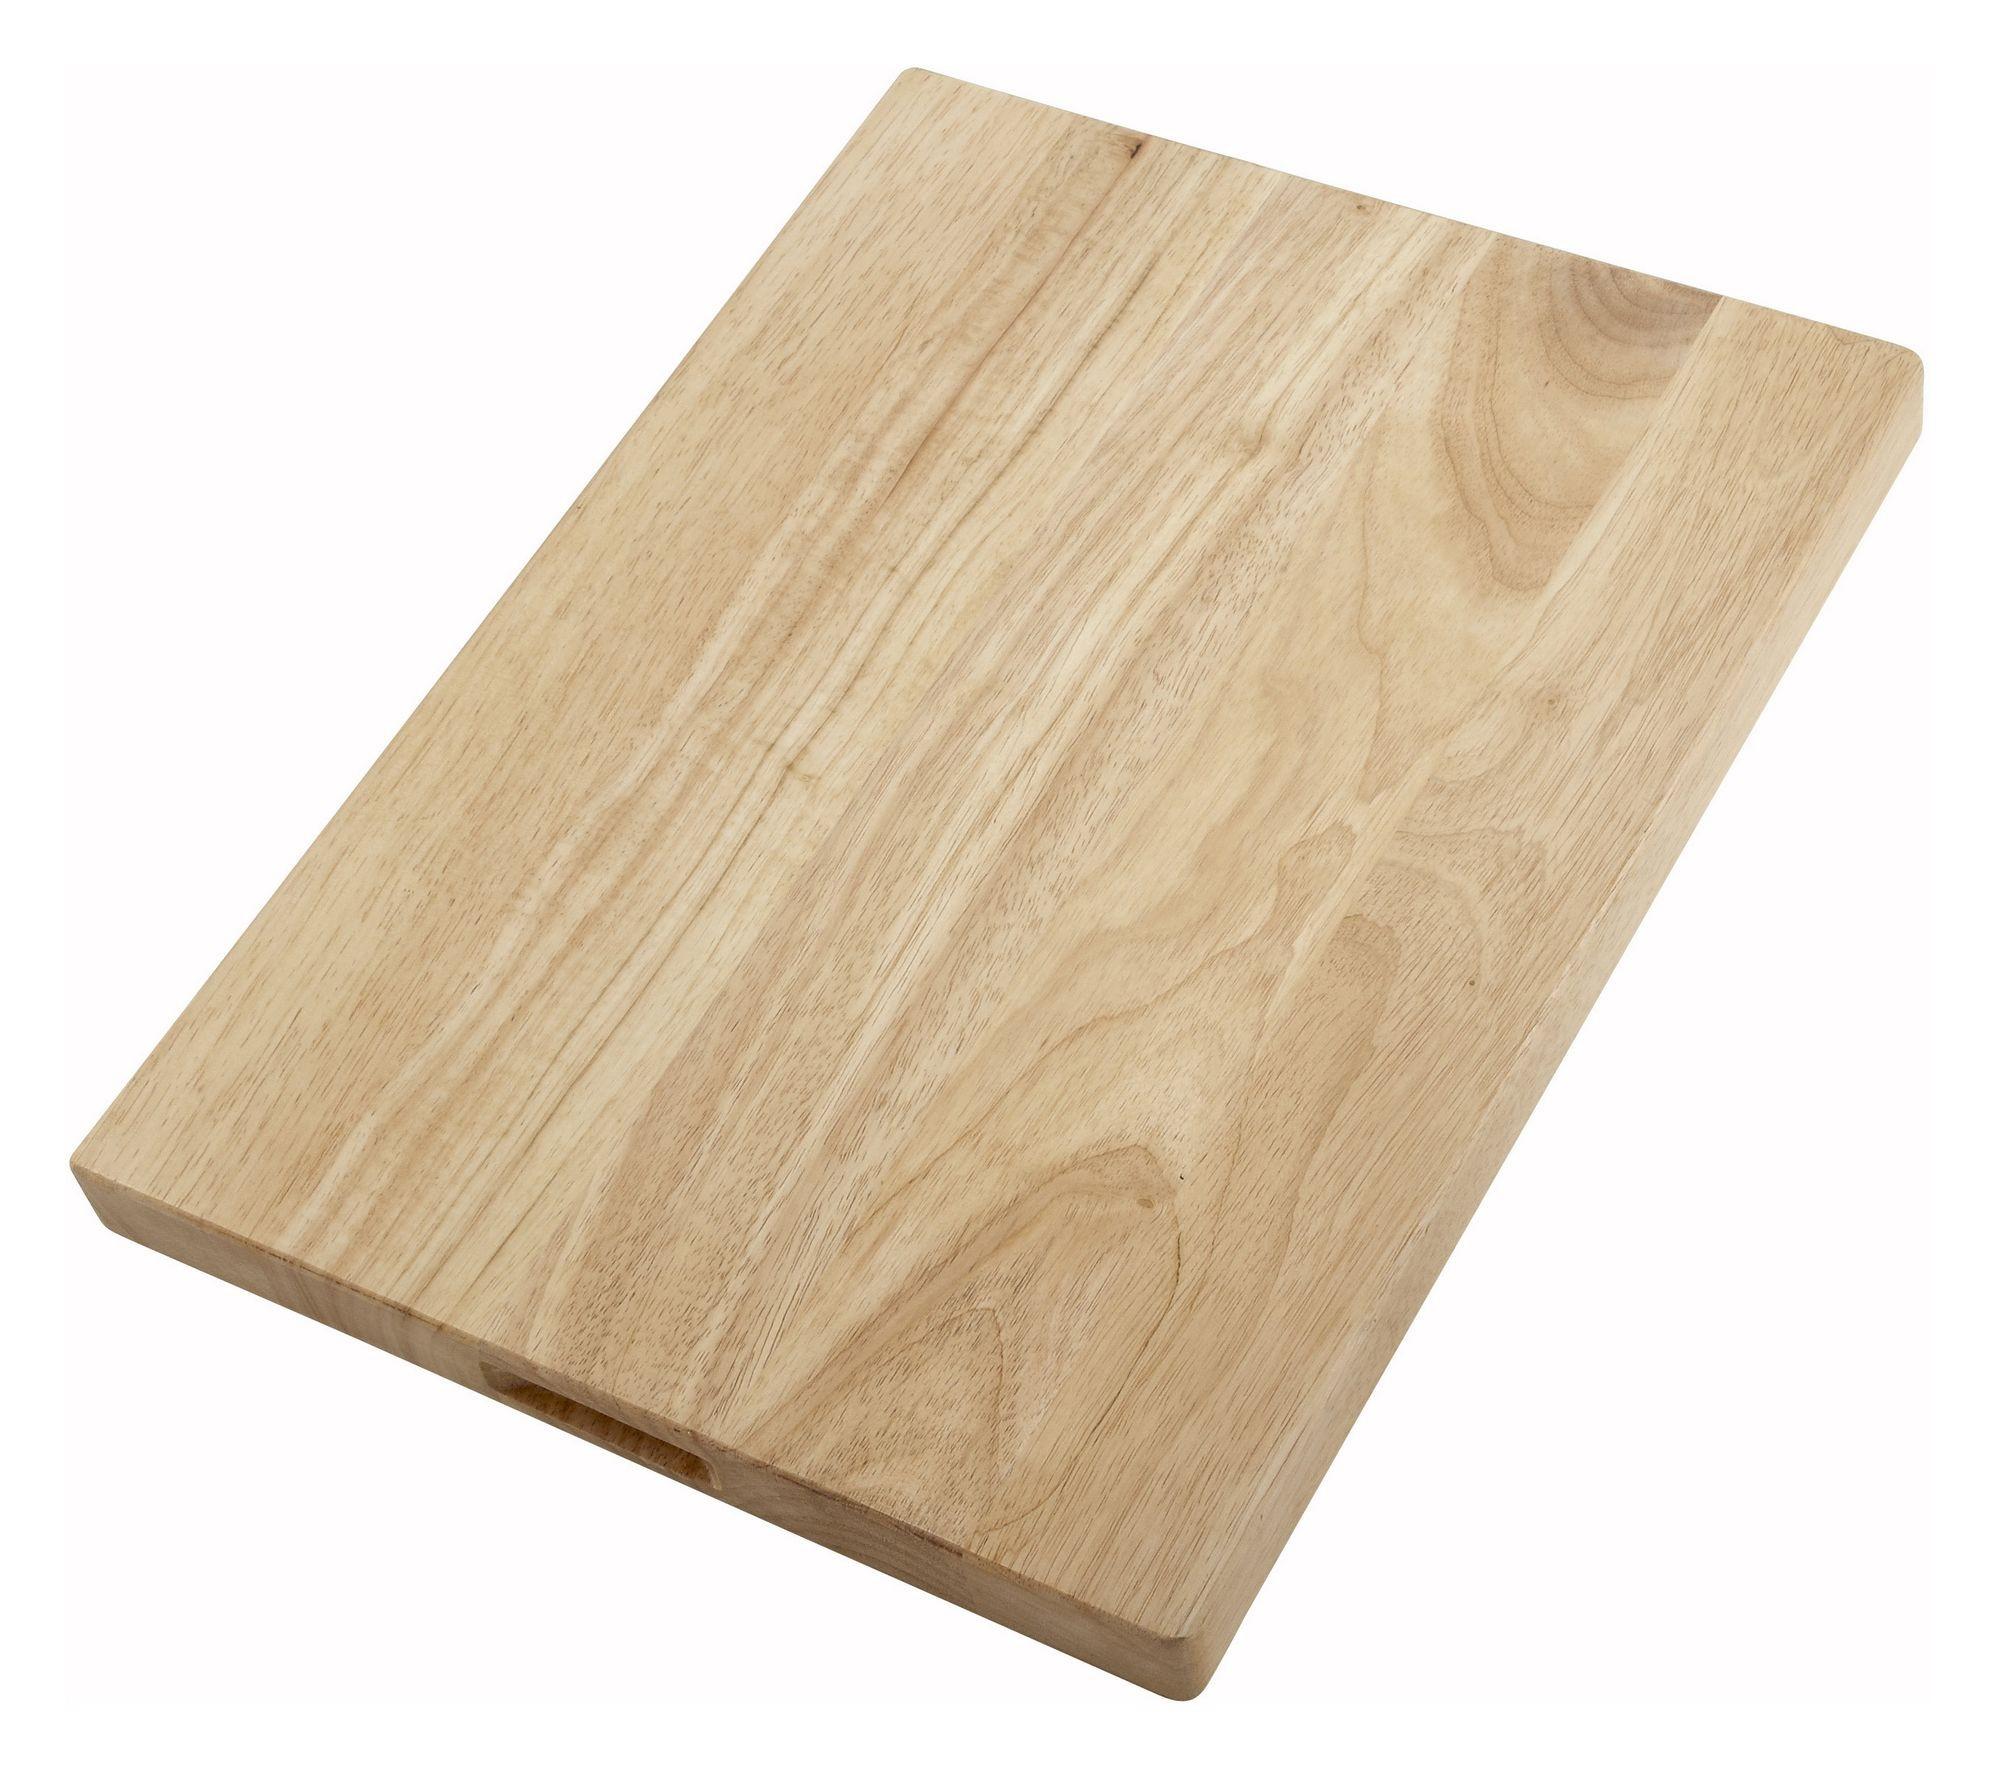 "Winco wcb-1520 Wood Butcher Block 15"" x 20"" x 1-3/4"" Thick"